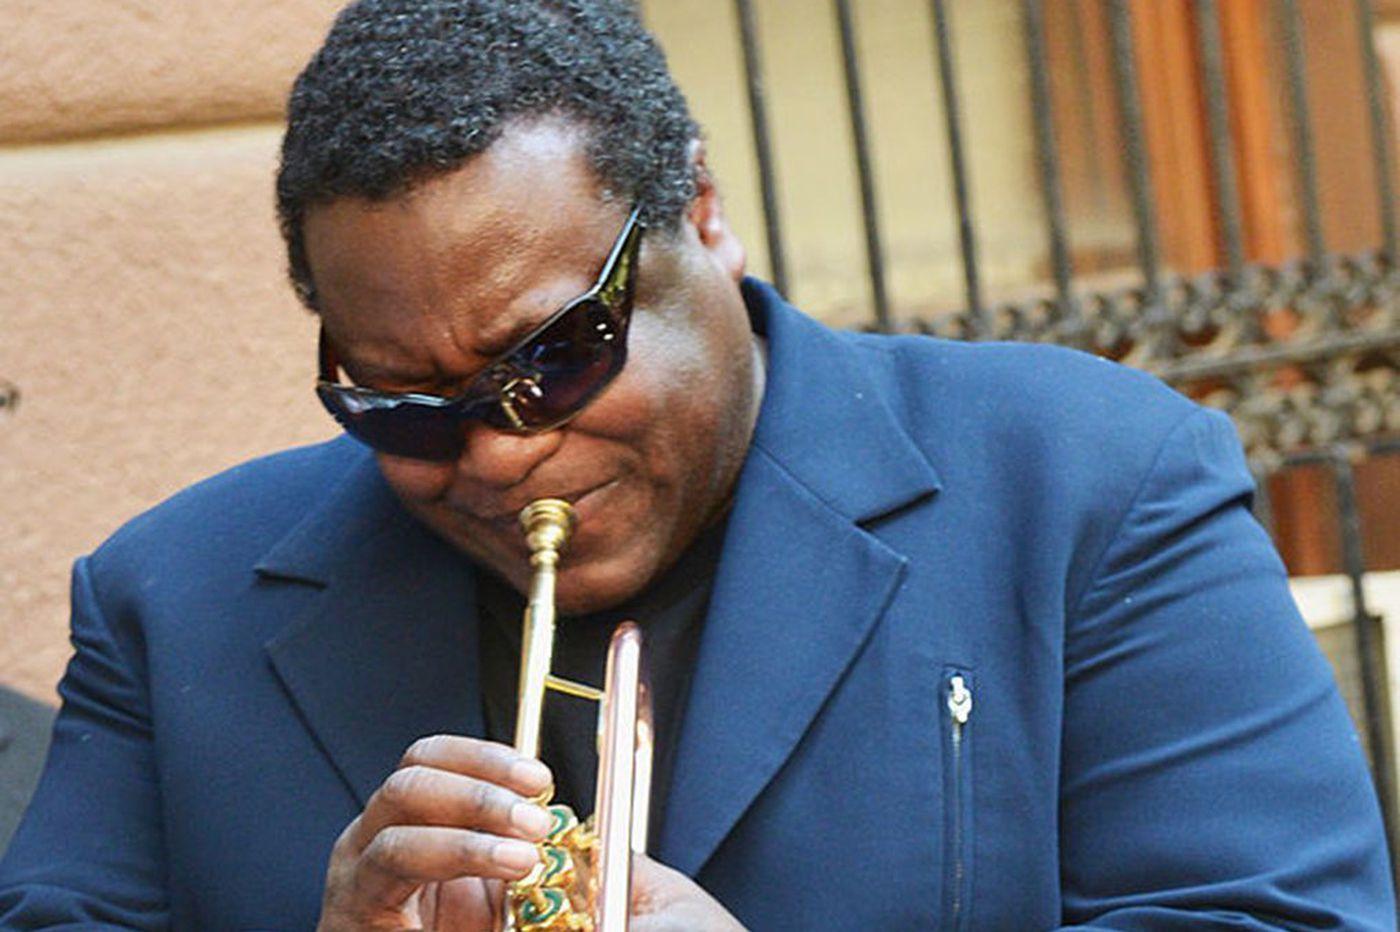 Wallace Roney Philadelphia Born Jazz Trumpeter Dies At 59 Of